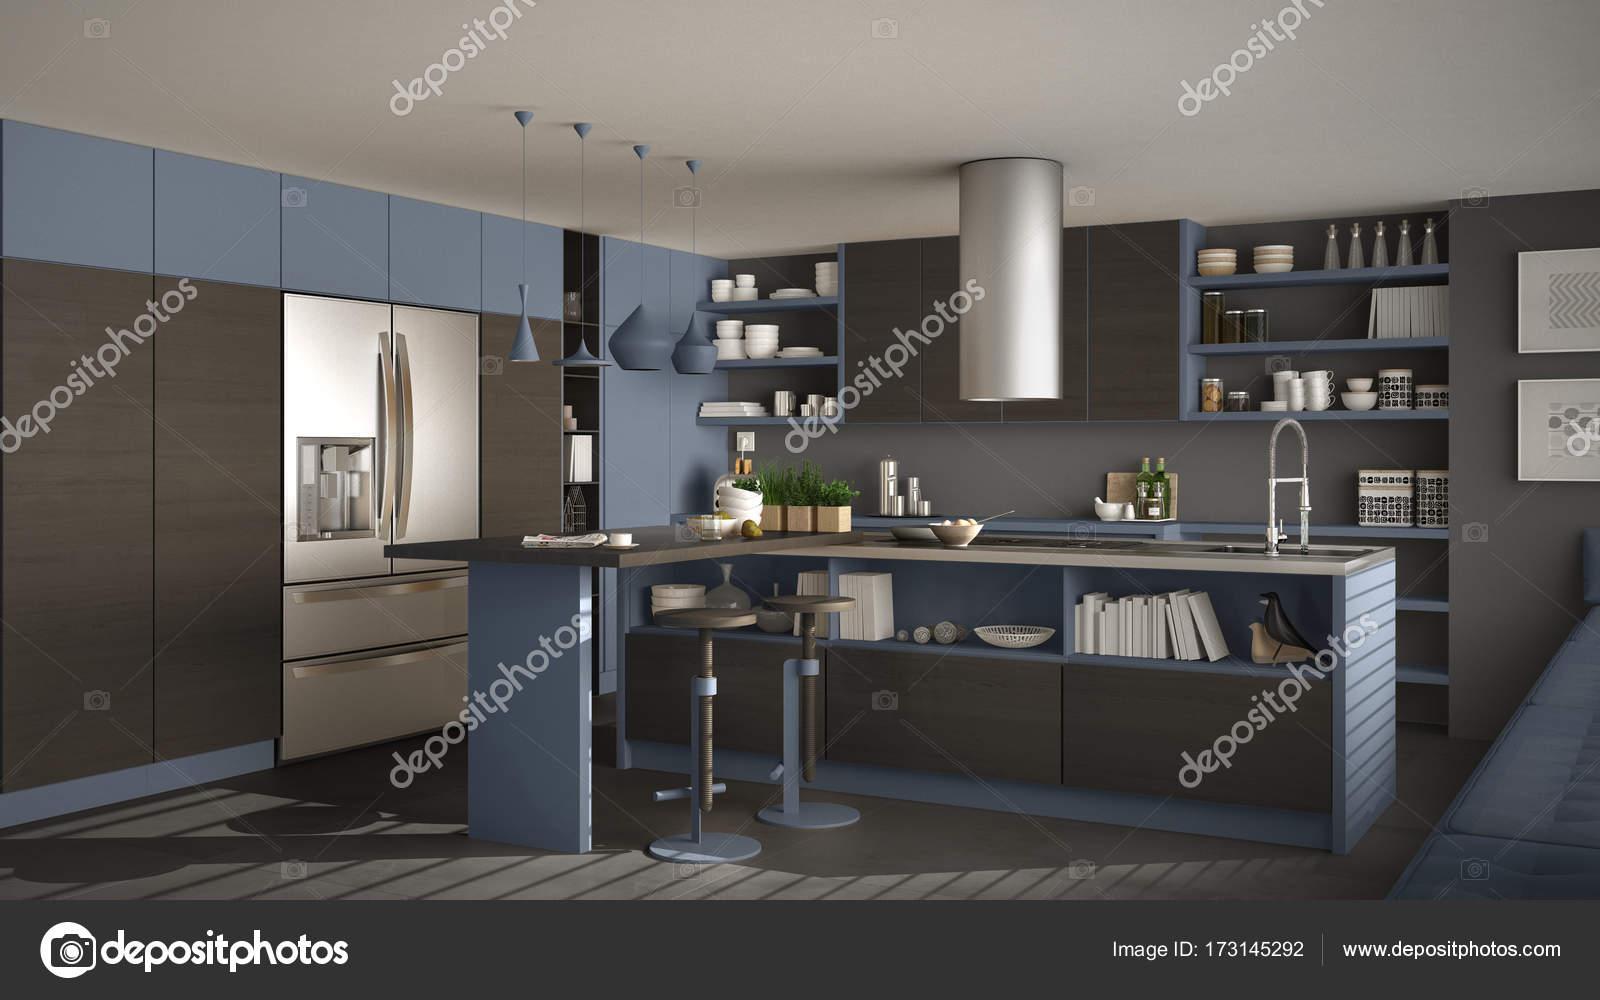 Moderne Blauw Keuken : Moderne houten keuken met houten details grijs en blauw minimale